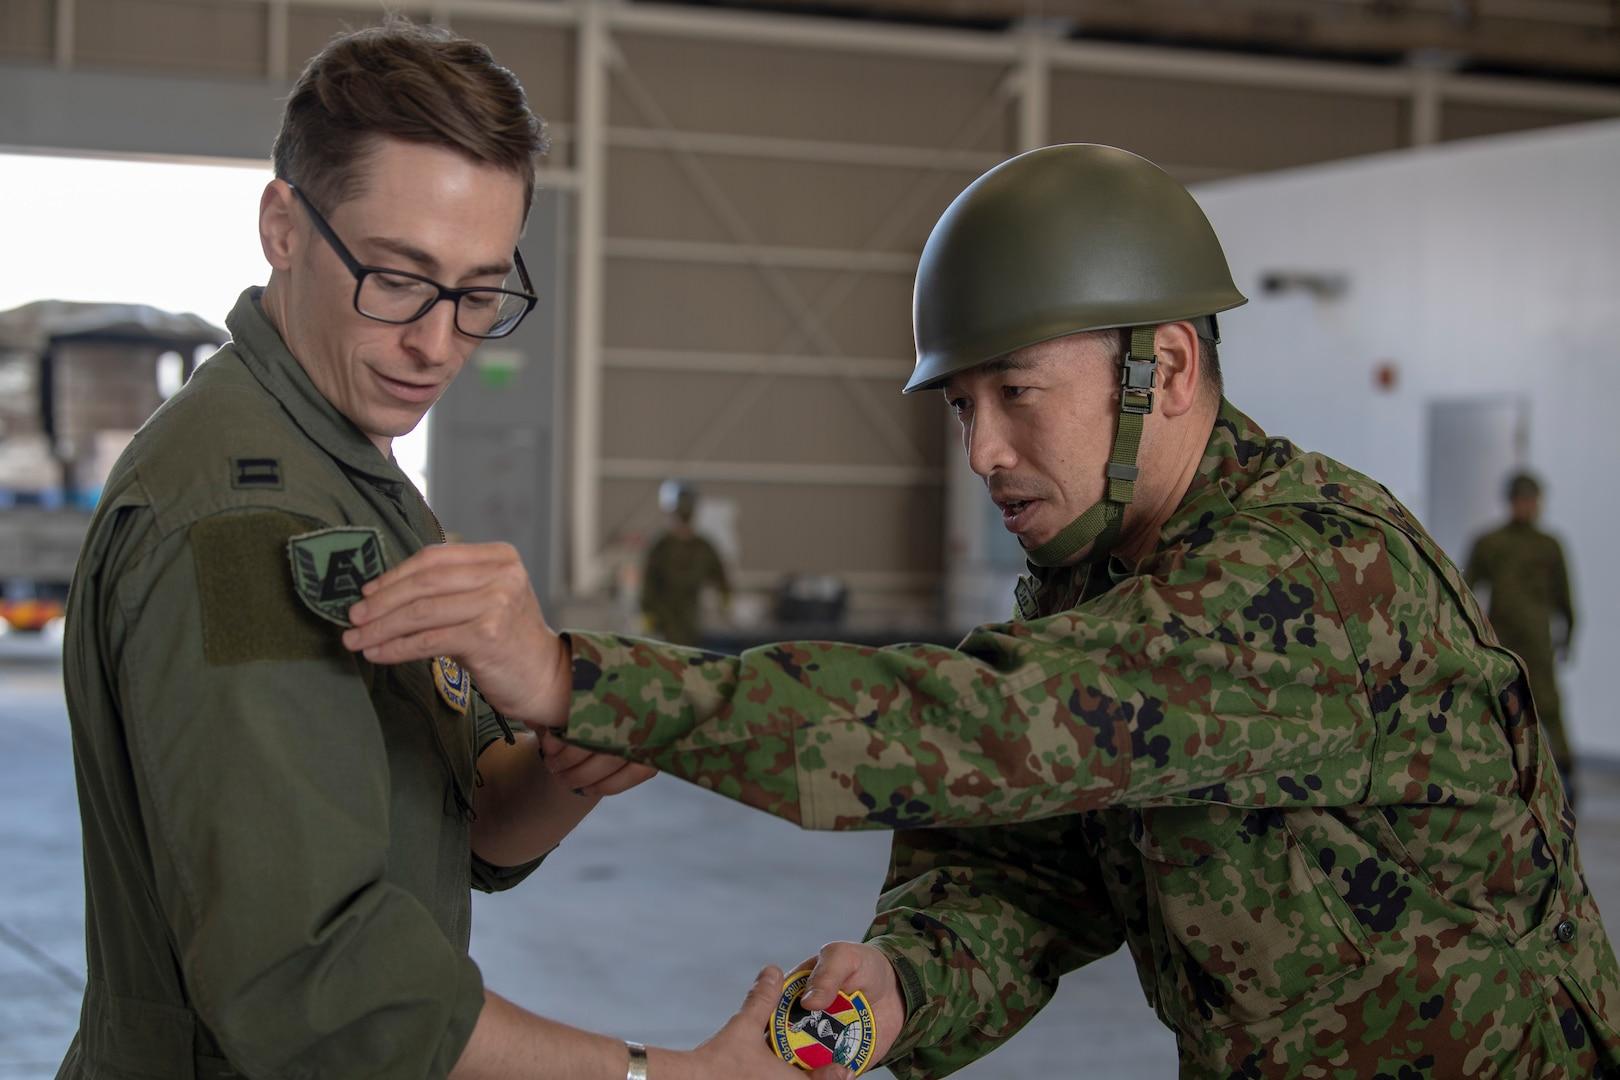 U.S., Japan Ground Self-Defense Force Team Up for Humanitarian Exercise in Komaki